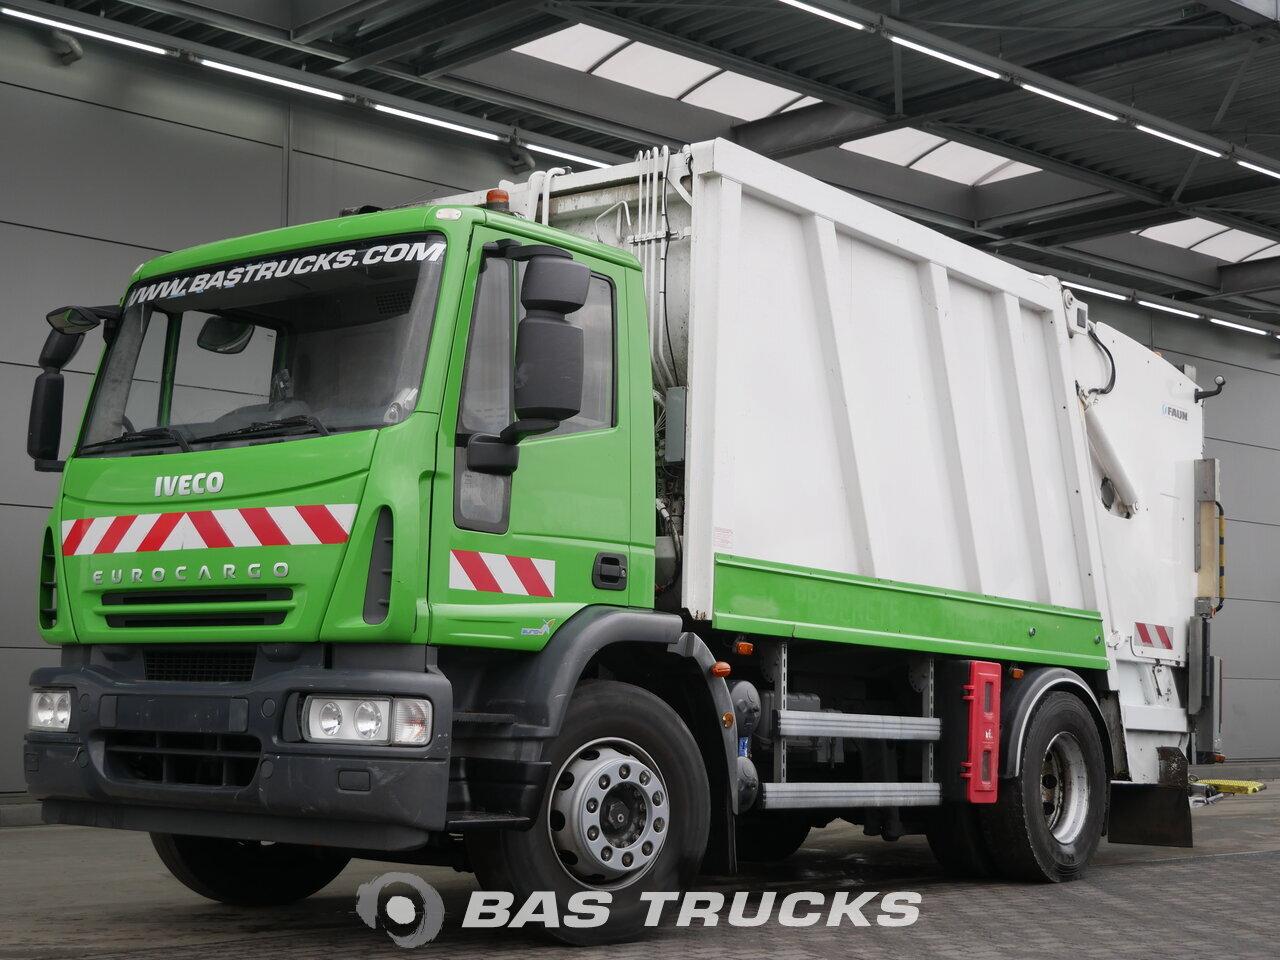 For sale at BAS Trucks: IVECO Eurocargo 180E25 4X2 07/2007